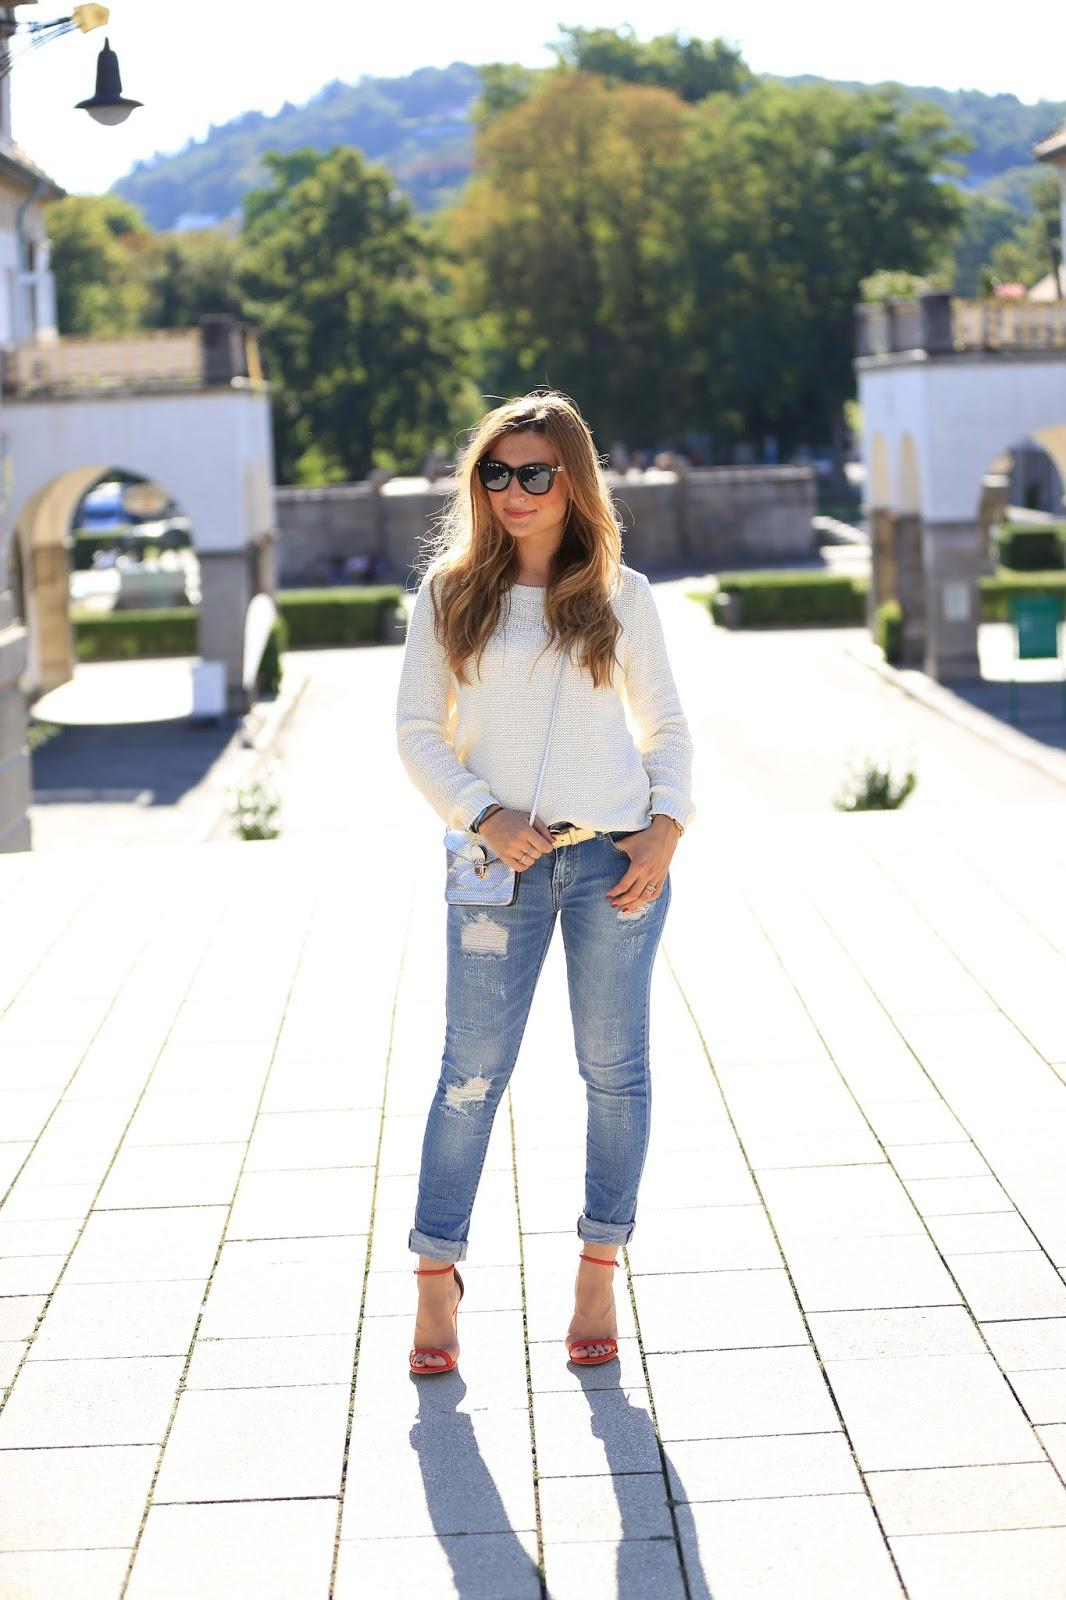 Modeblog-Deutschland-Modebloggerin-Fashion-Blog-Köln-OOTD - fashionstylebyjohanna